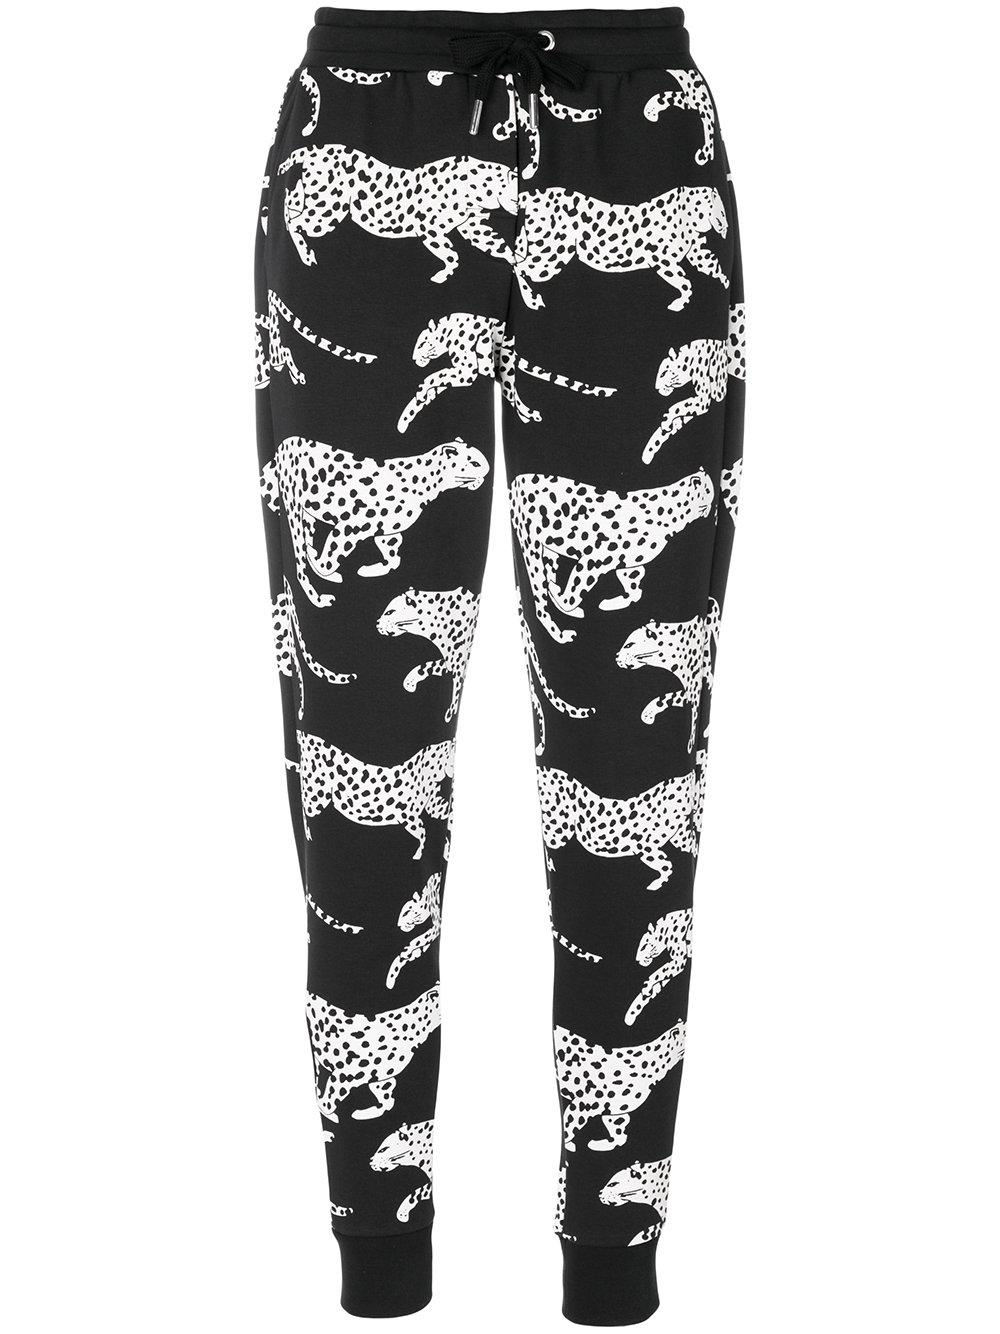 Zoe Karssen Leopard Print Joggers